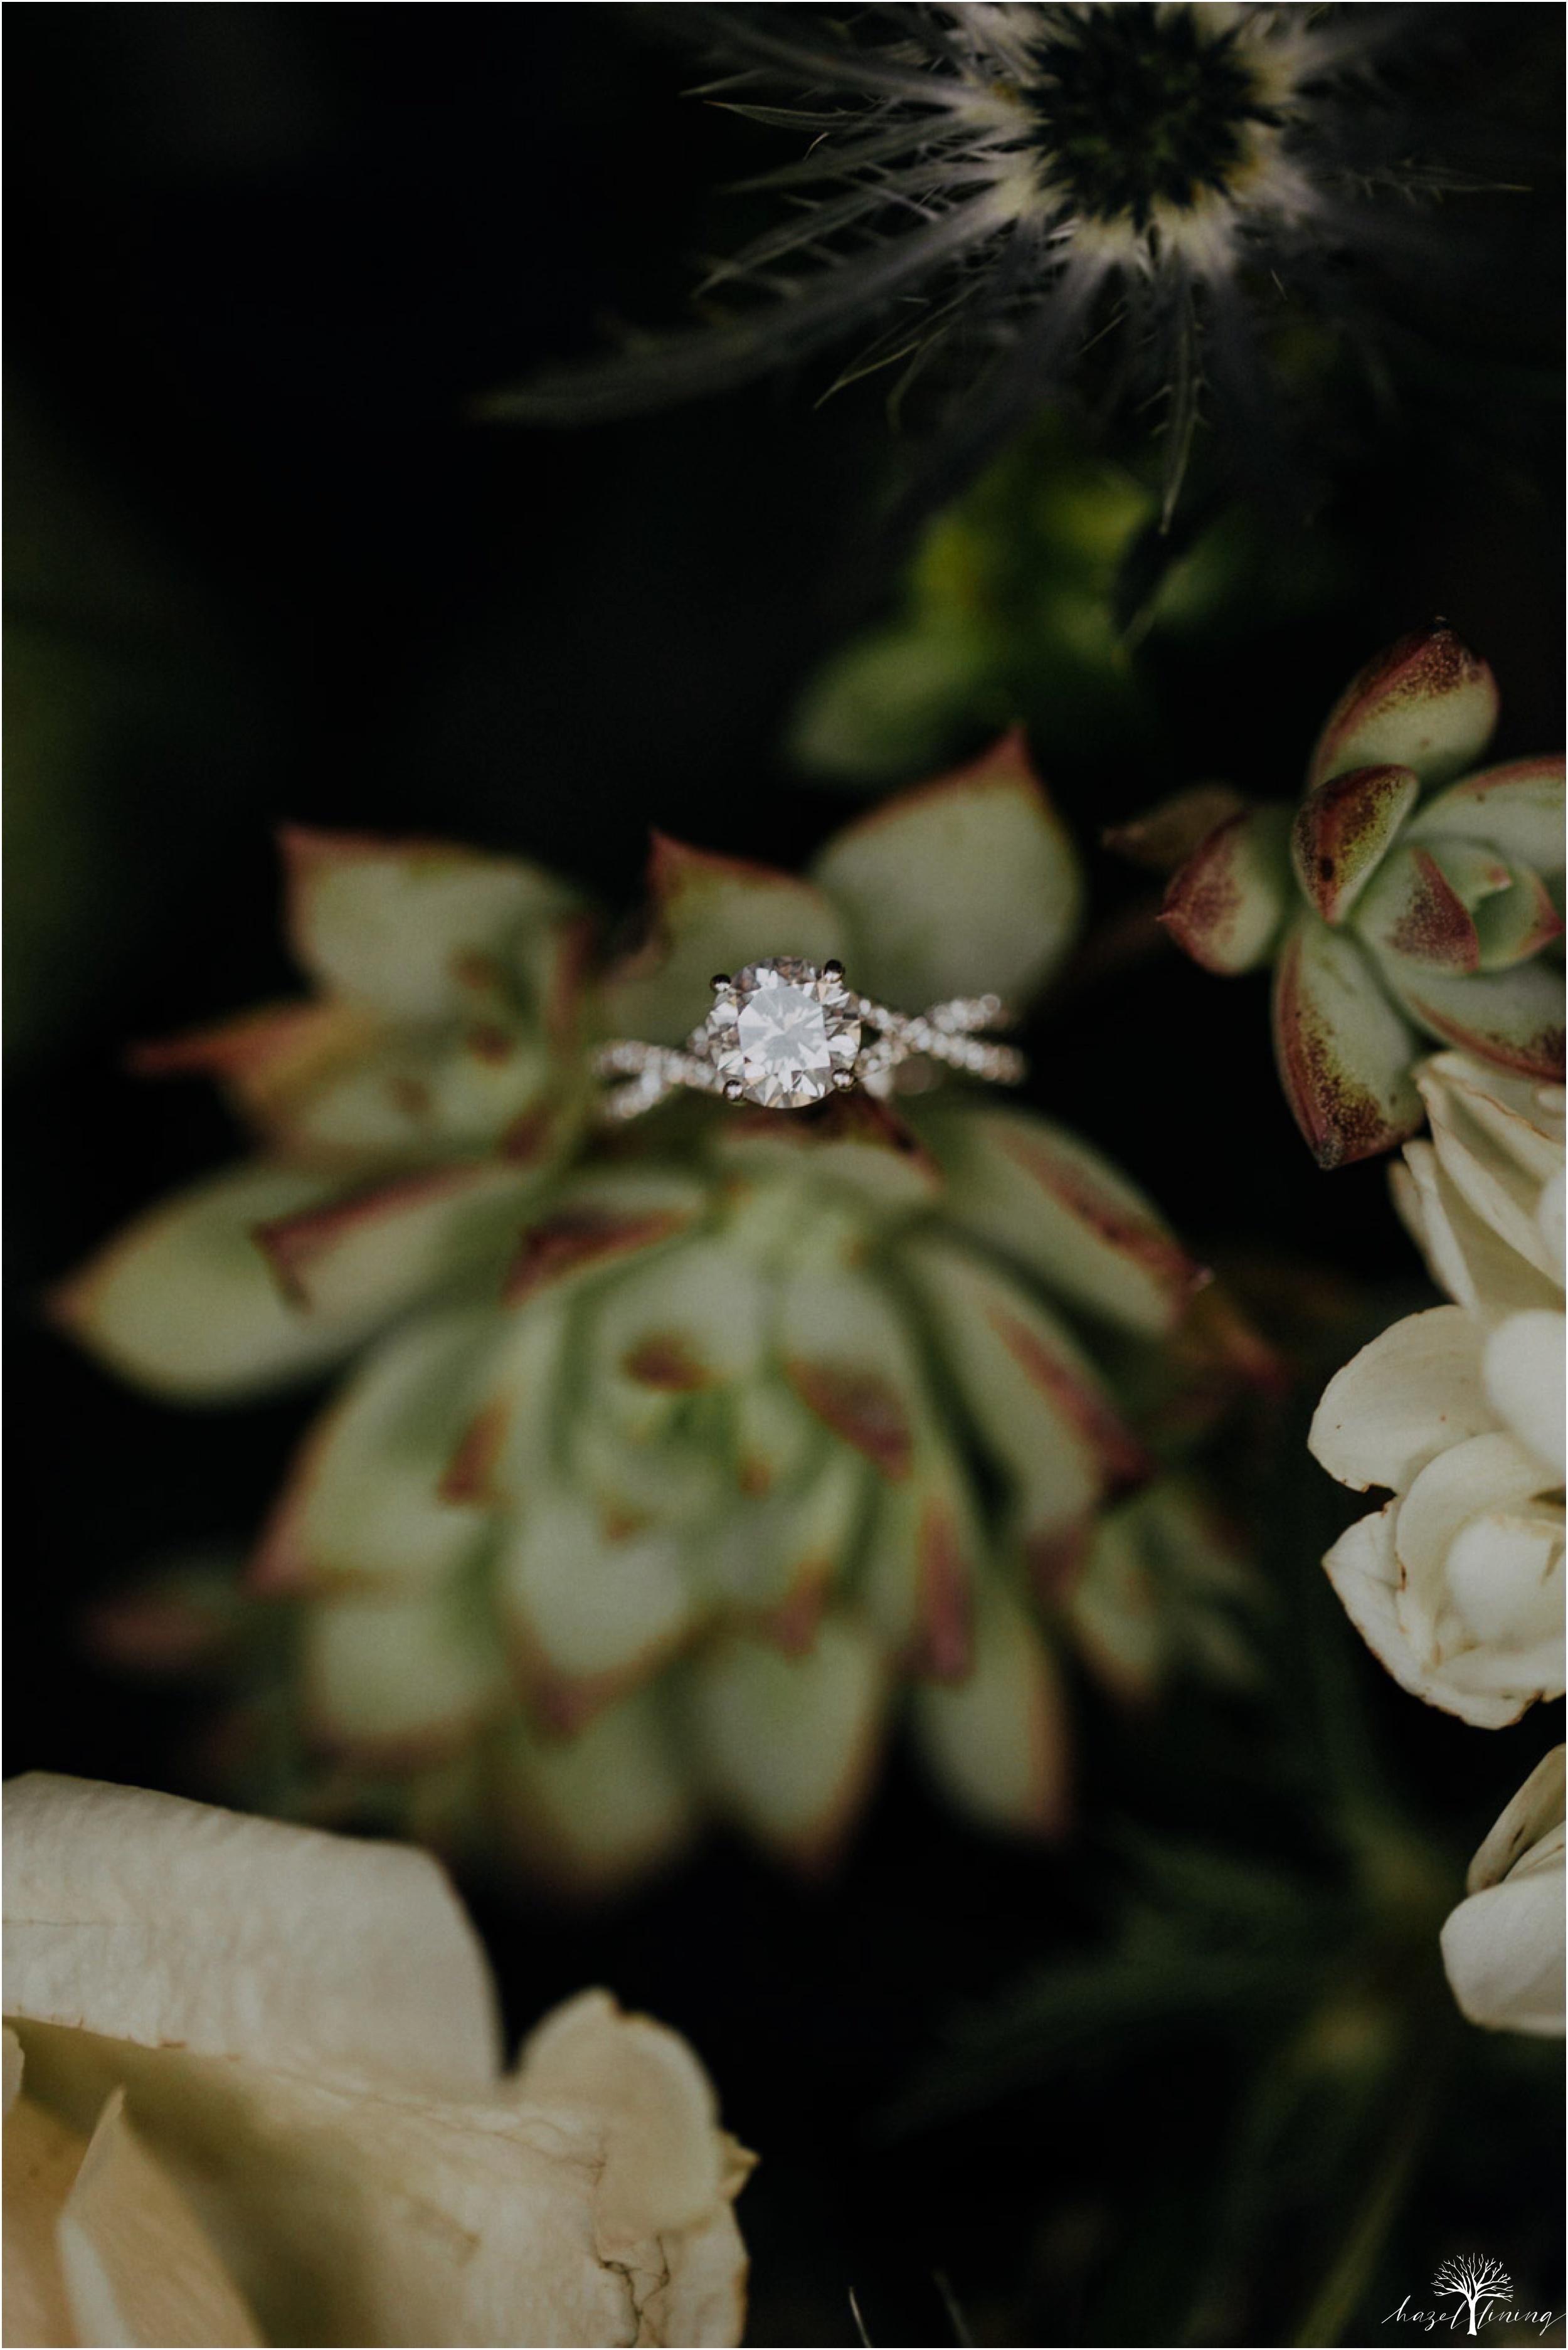 maureen-hepner-anthony-giordano-rose-bank-winery-newtow-pennsylvania-luxury-summer-wedding-hazel-lining-photography-destination-elopement-wedding-engagement-photography_0010.jpg